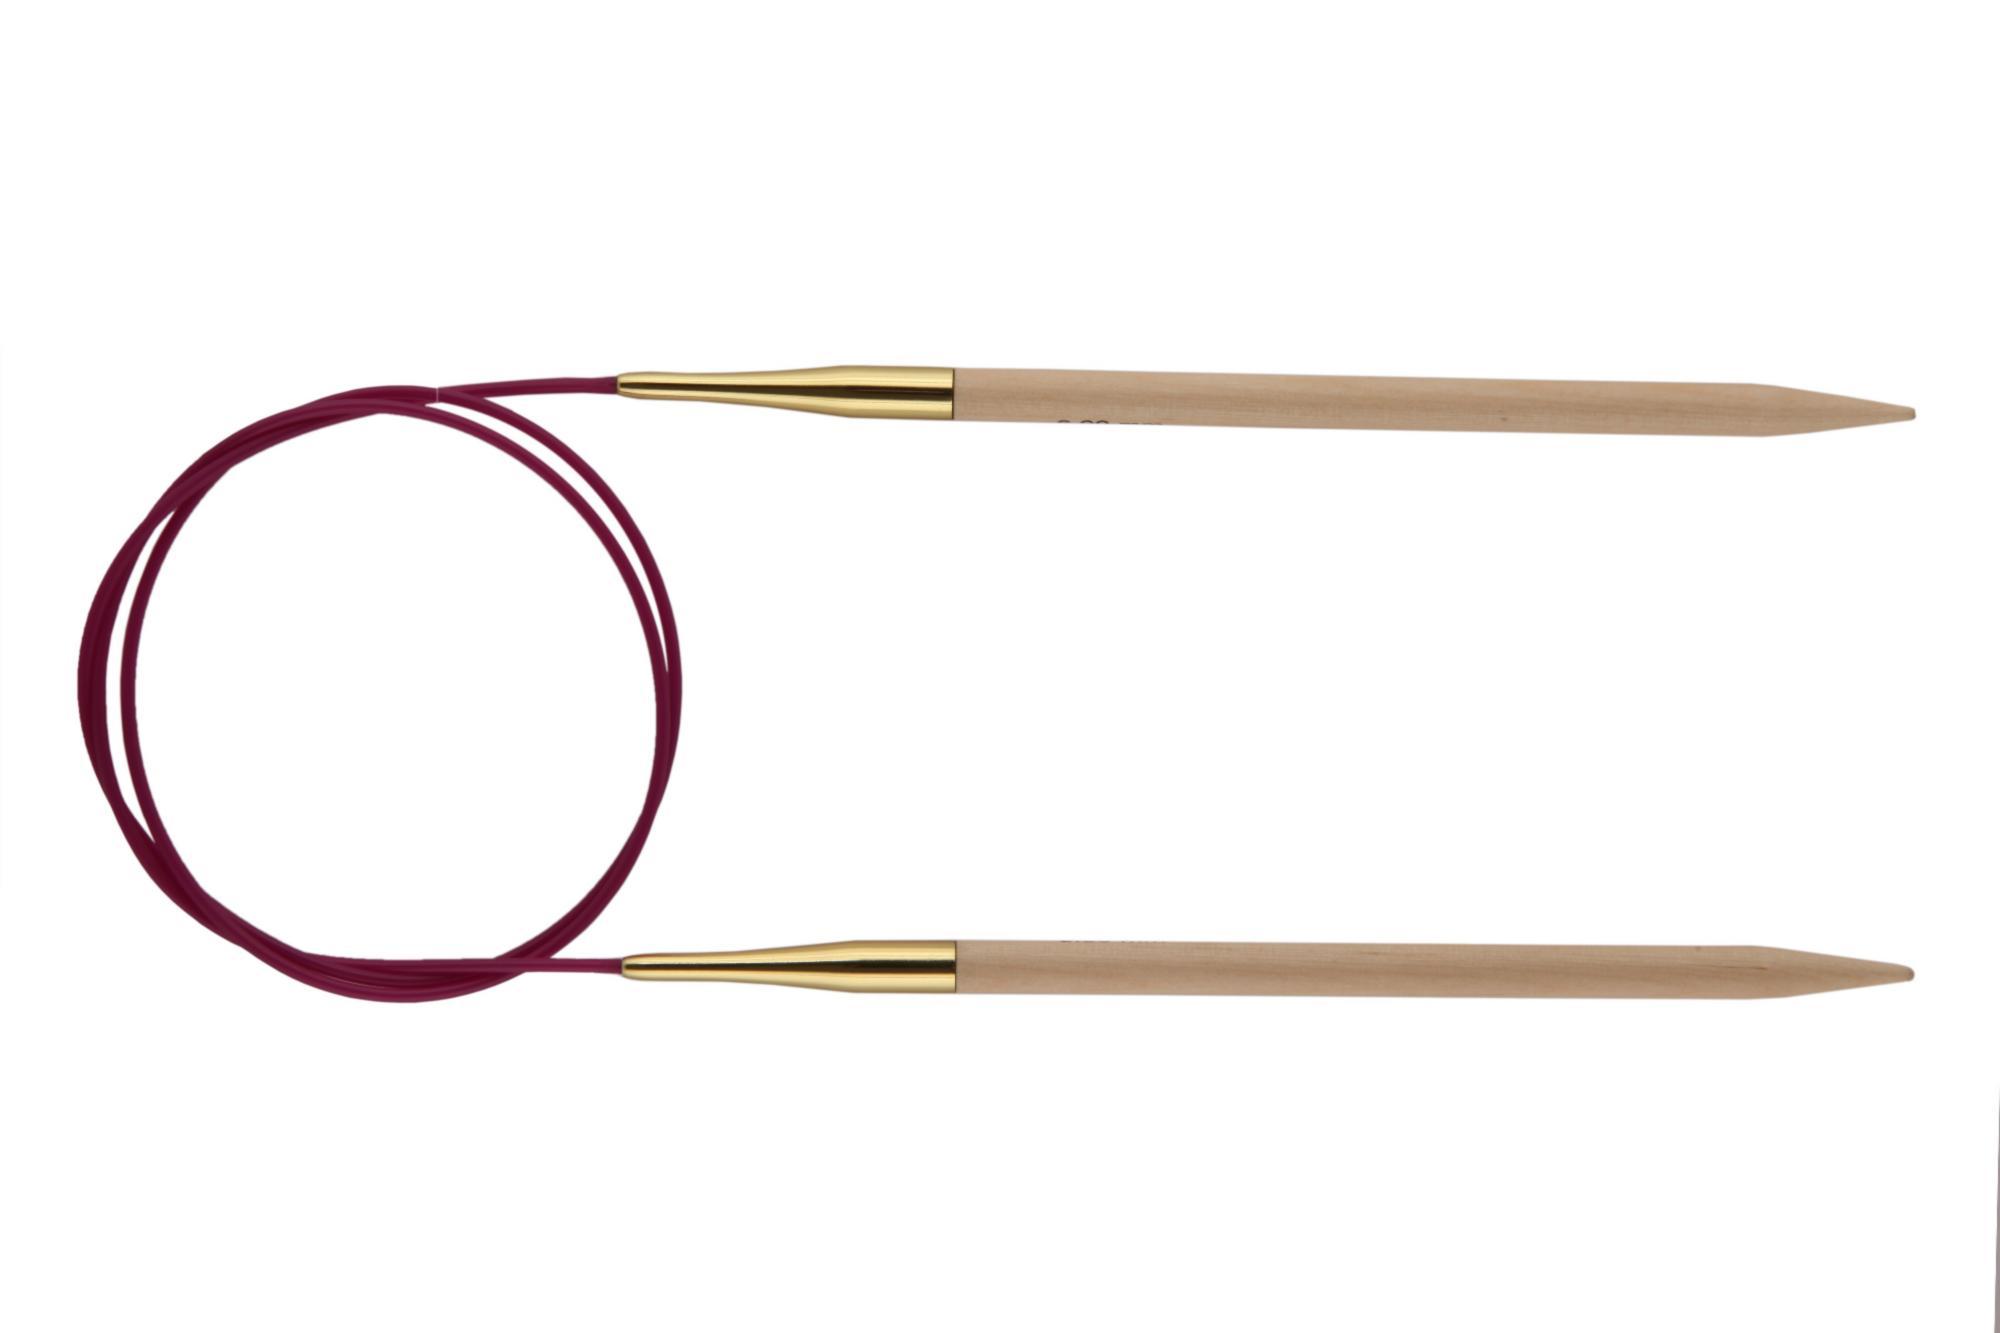 Спицы круговые 60 см Basix Birch Wood KnitPro, 35323, 6.50 мм